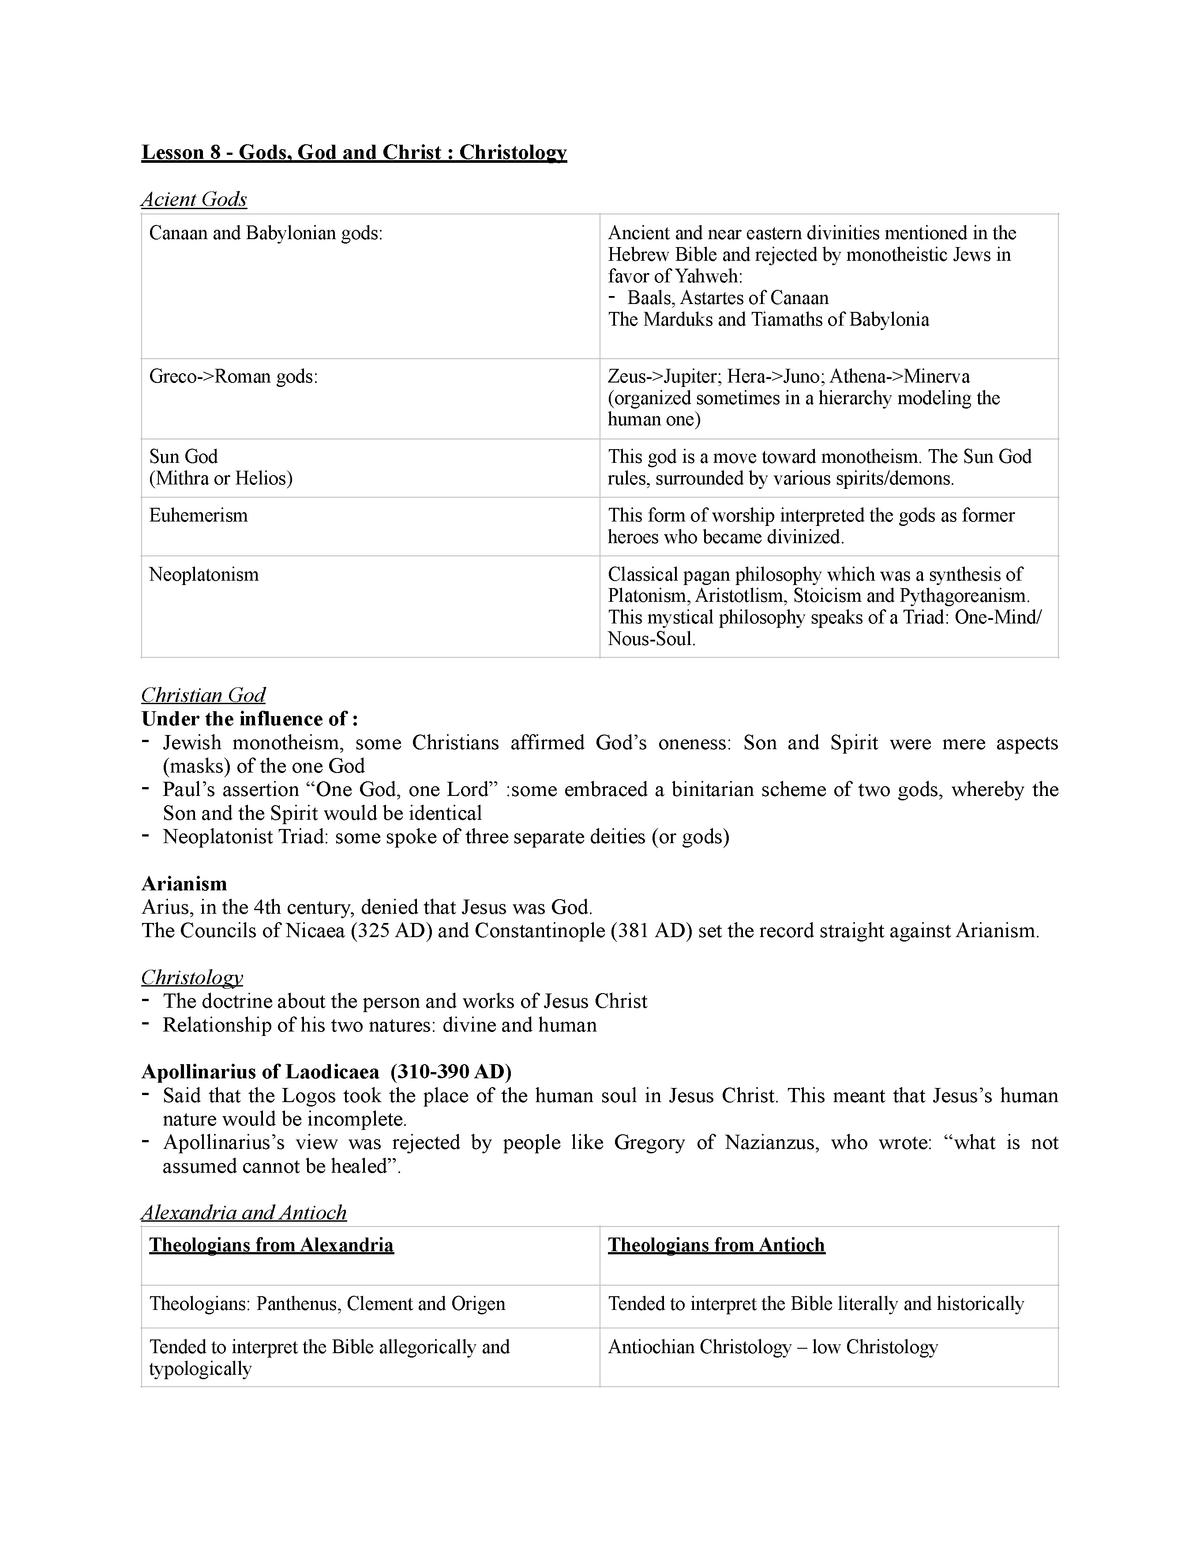 Lesson 8 - Lecture notes 8 - THEO 206 - Concordia - StuDocu